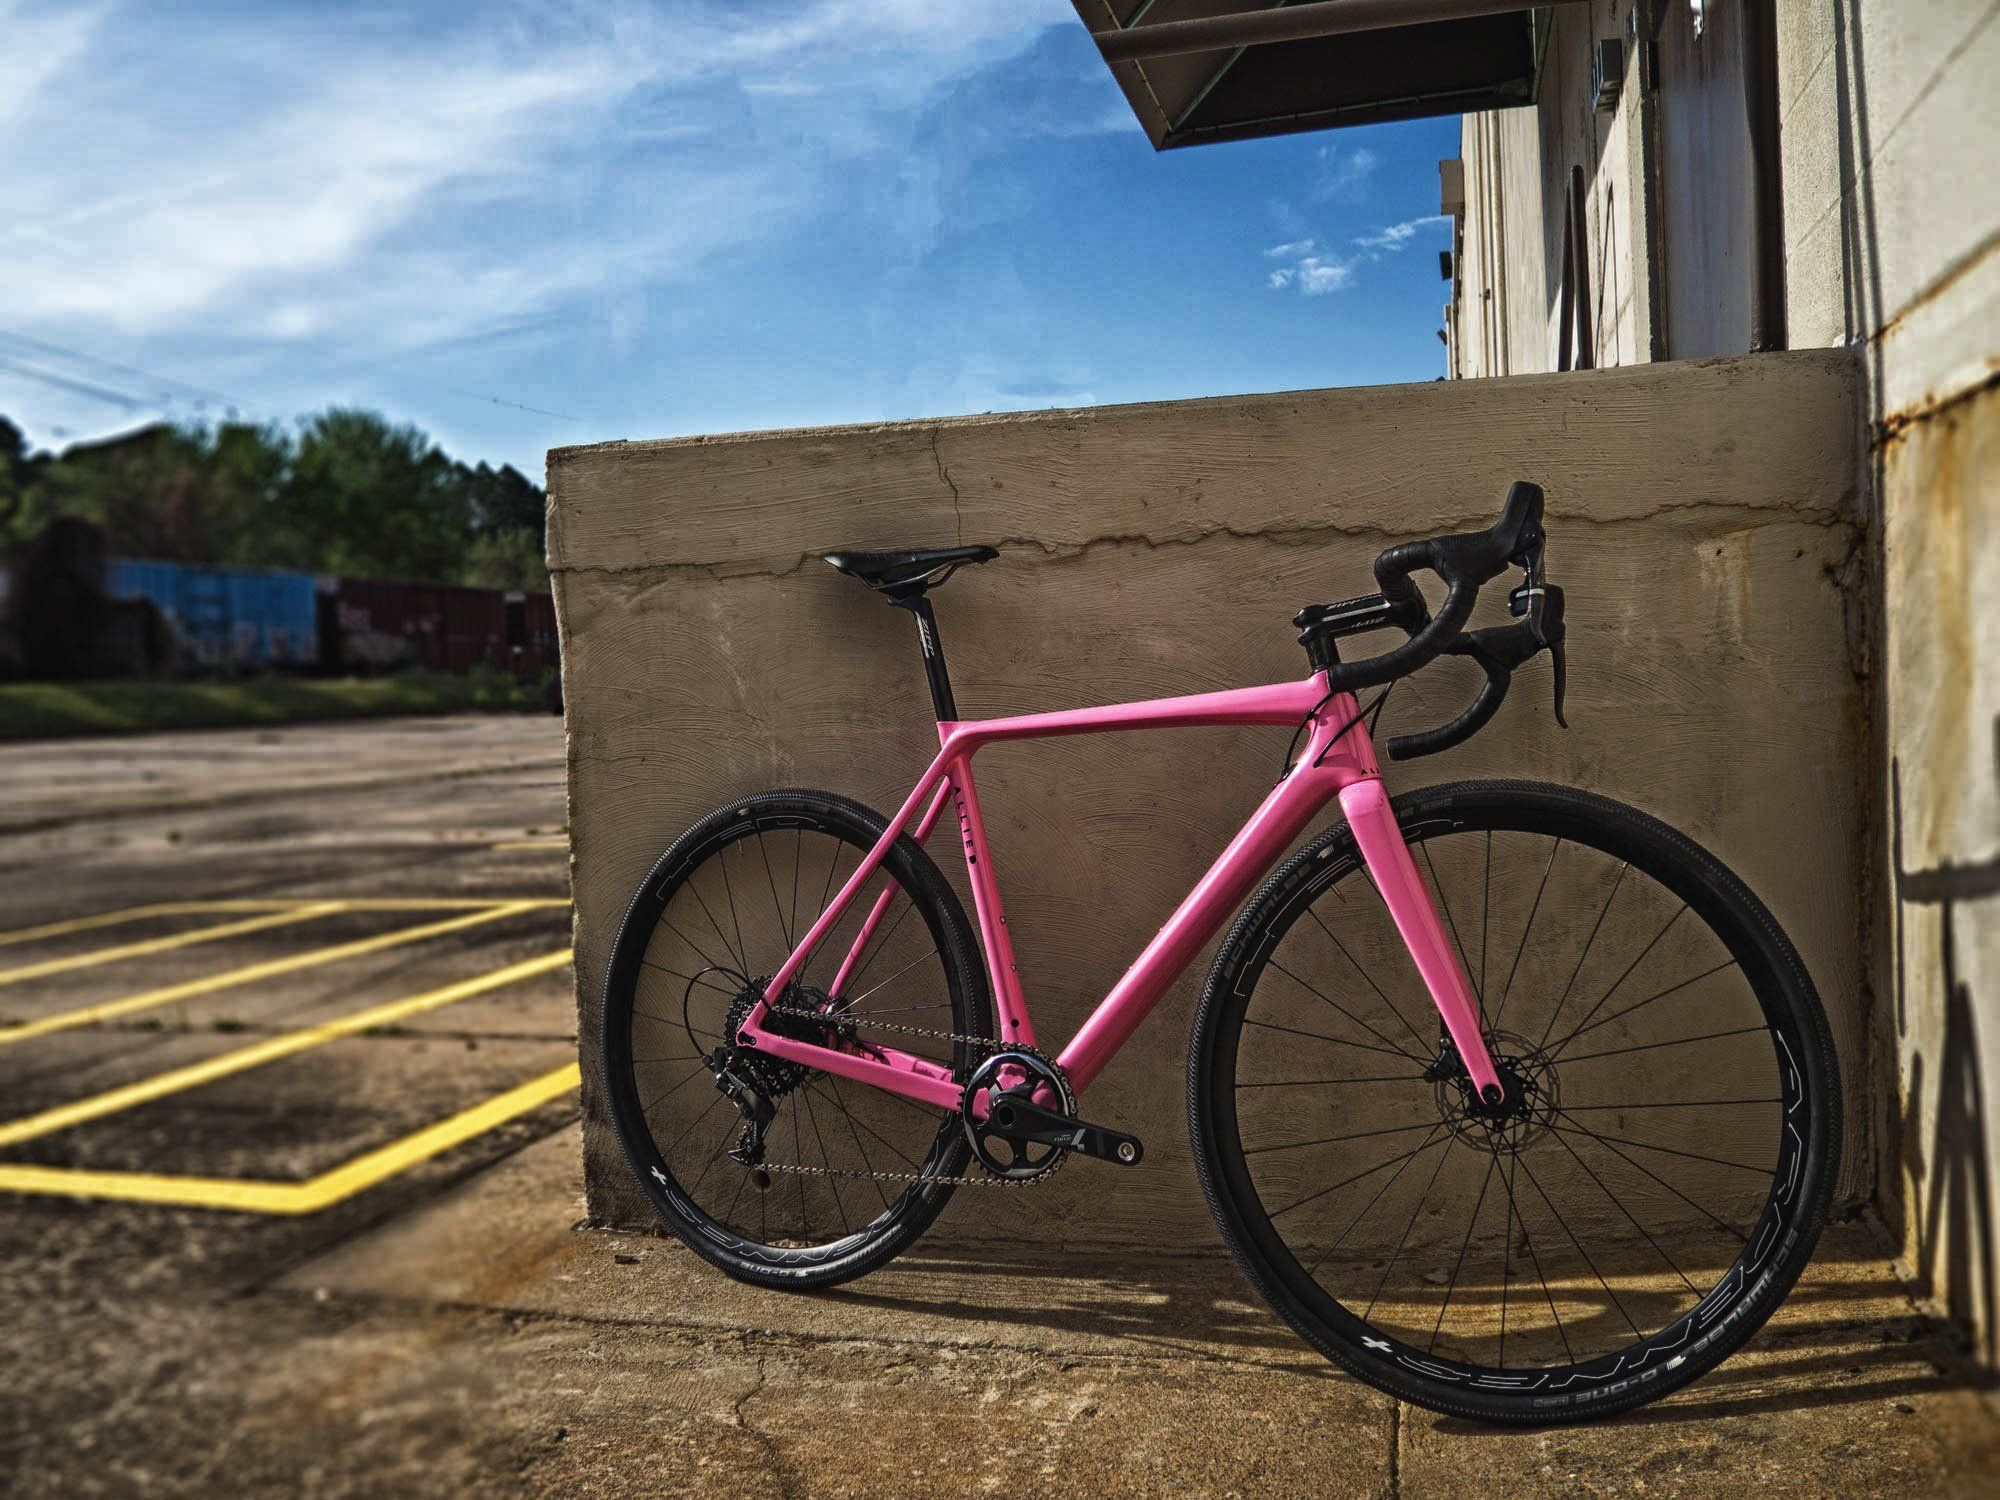 Allied Alfa Allroad Sram Force 1x Bike Road Bikes Carbon Fiber